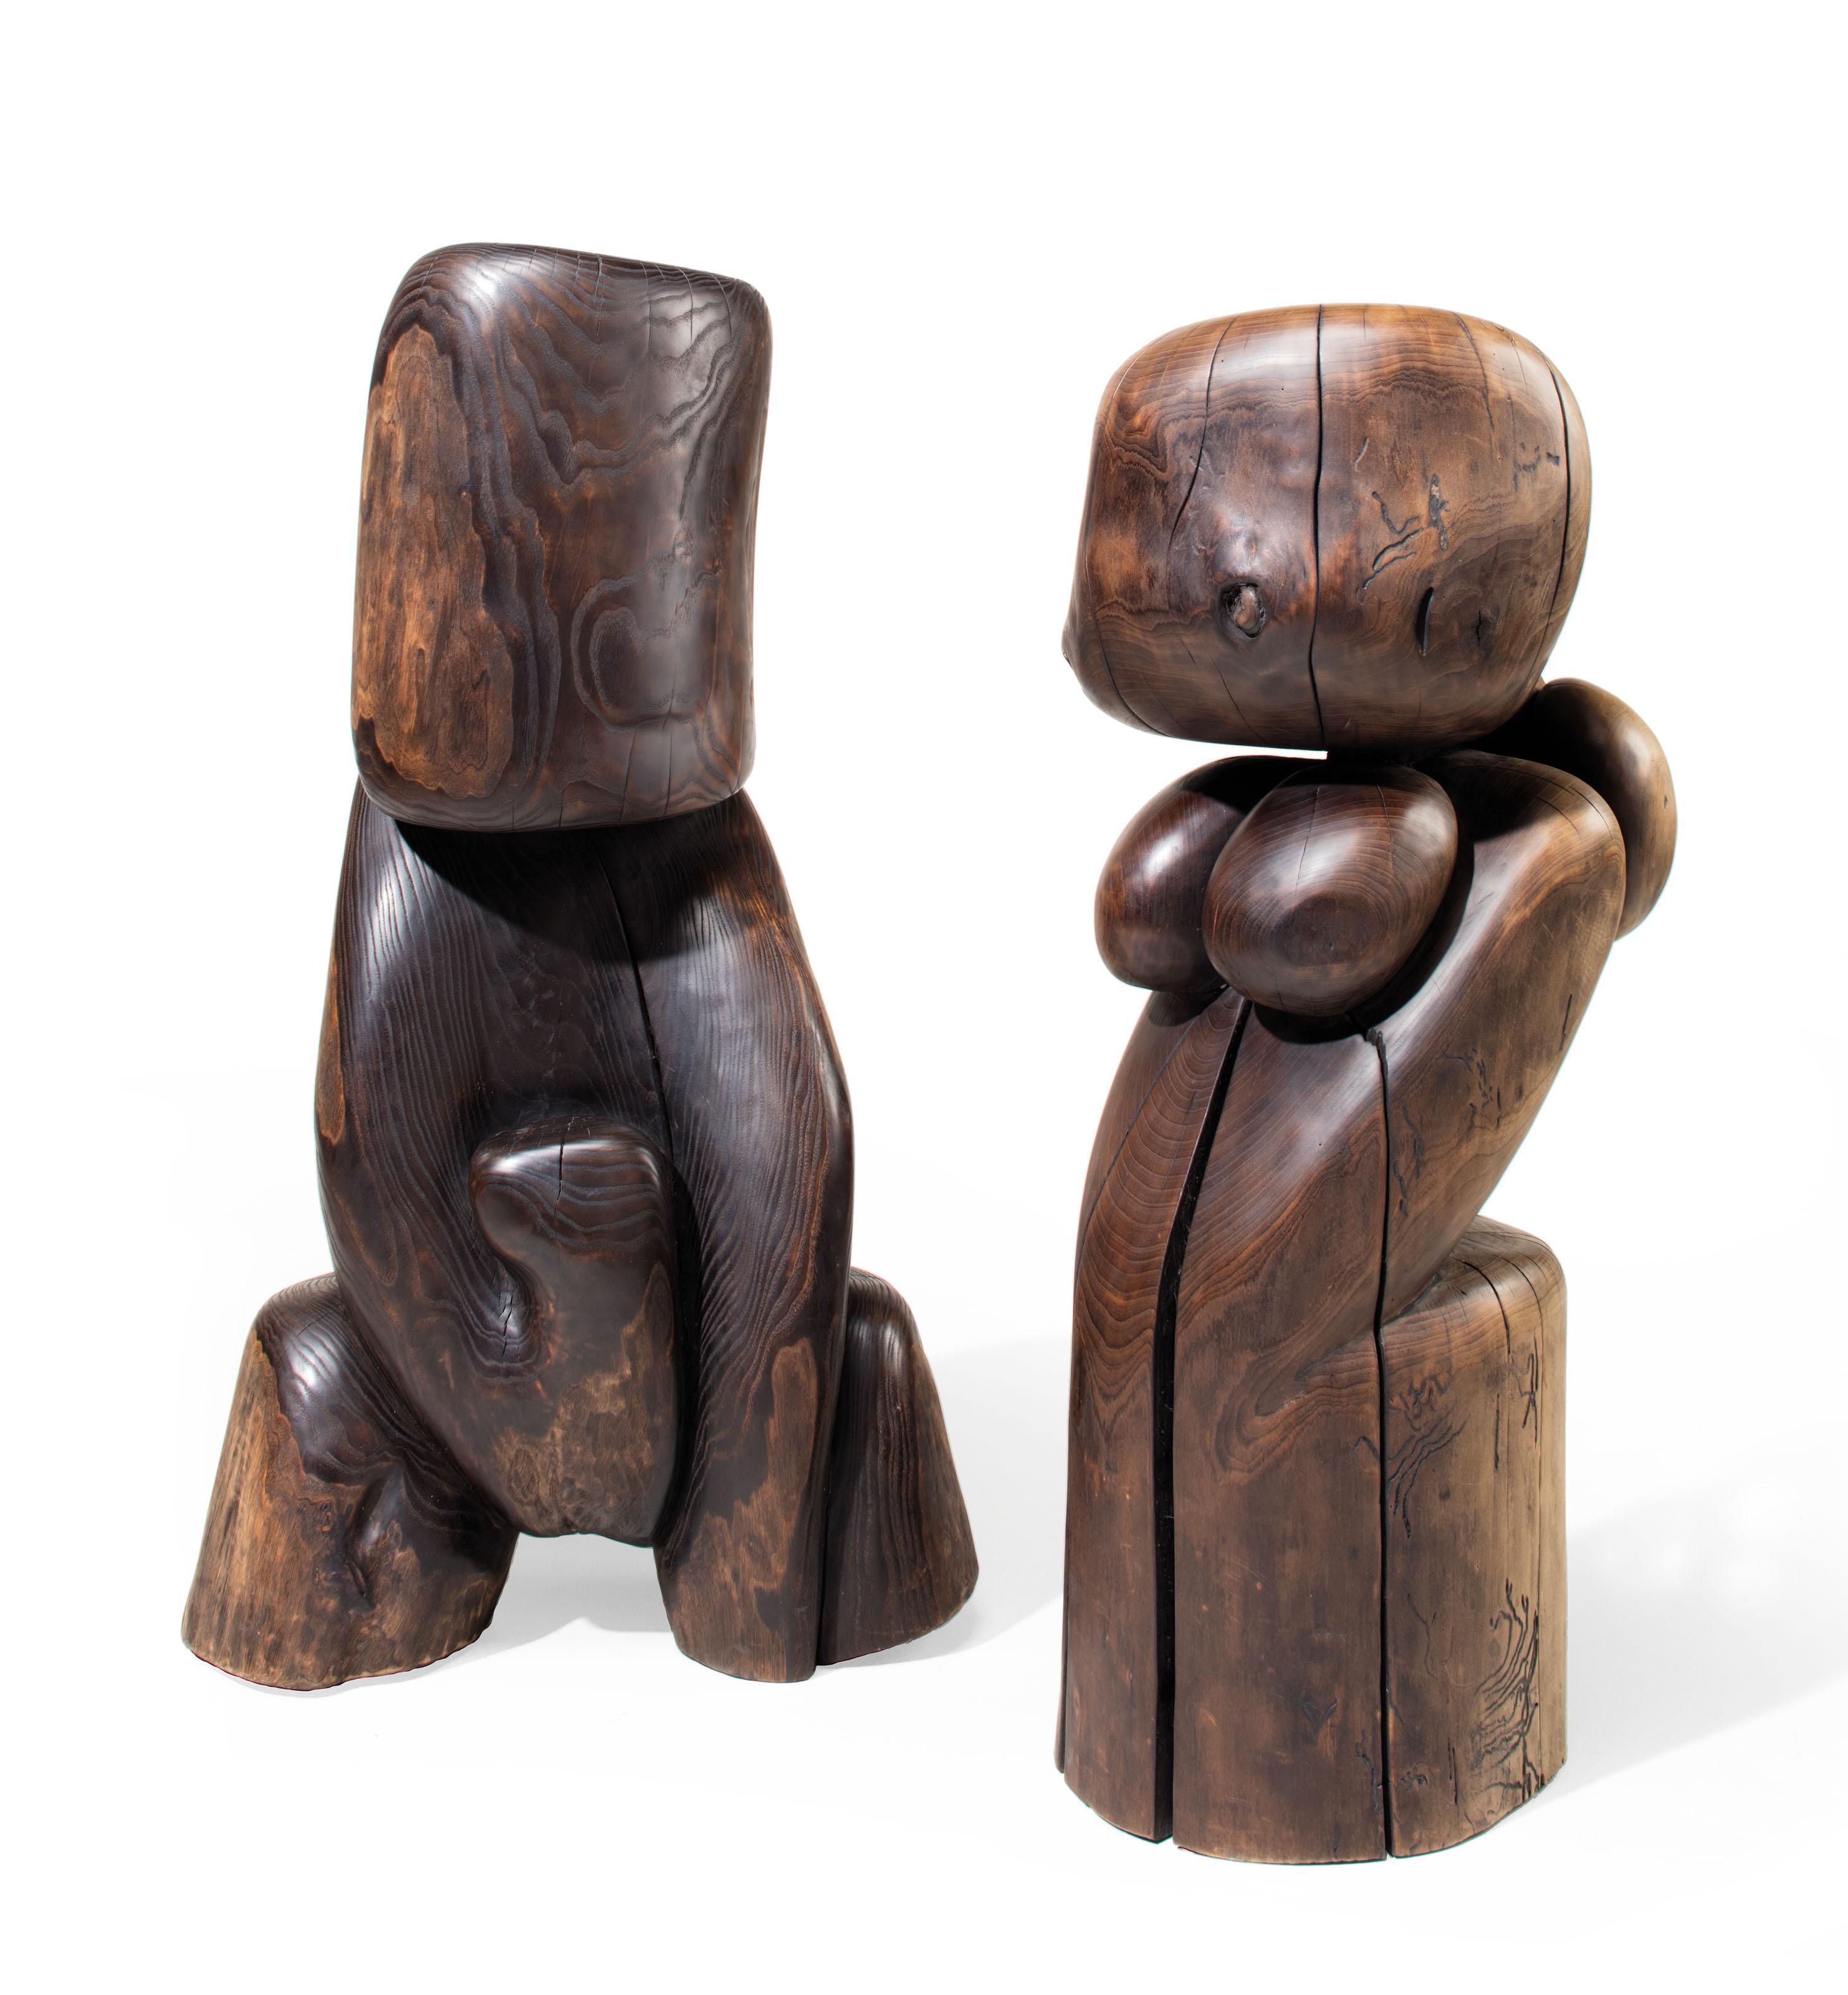 Untitled (Male); & Untitled (Female)